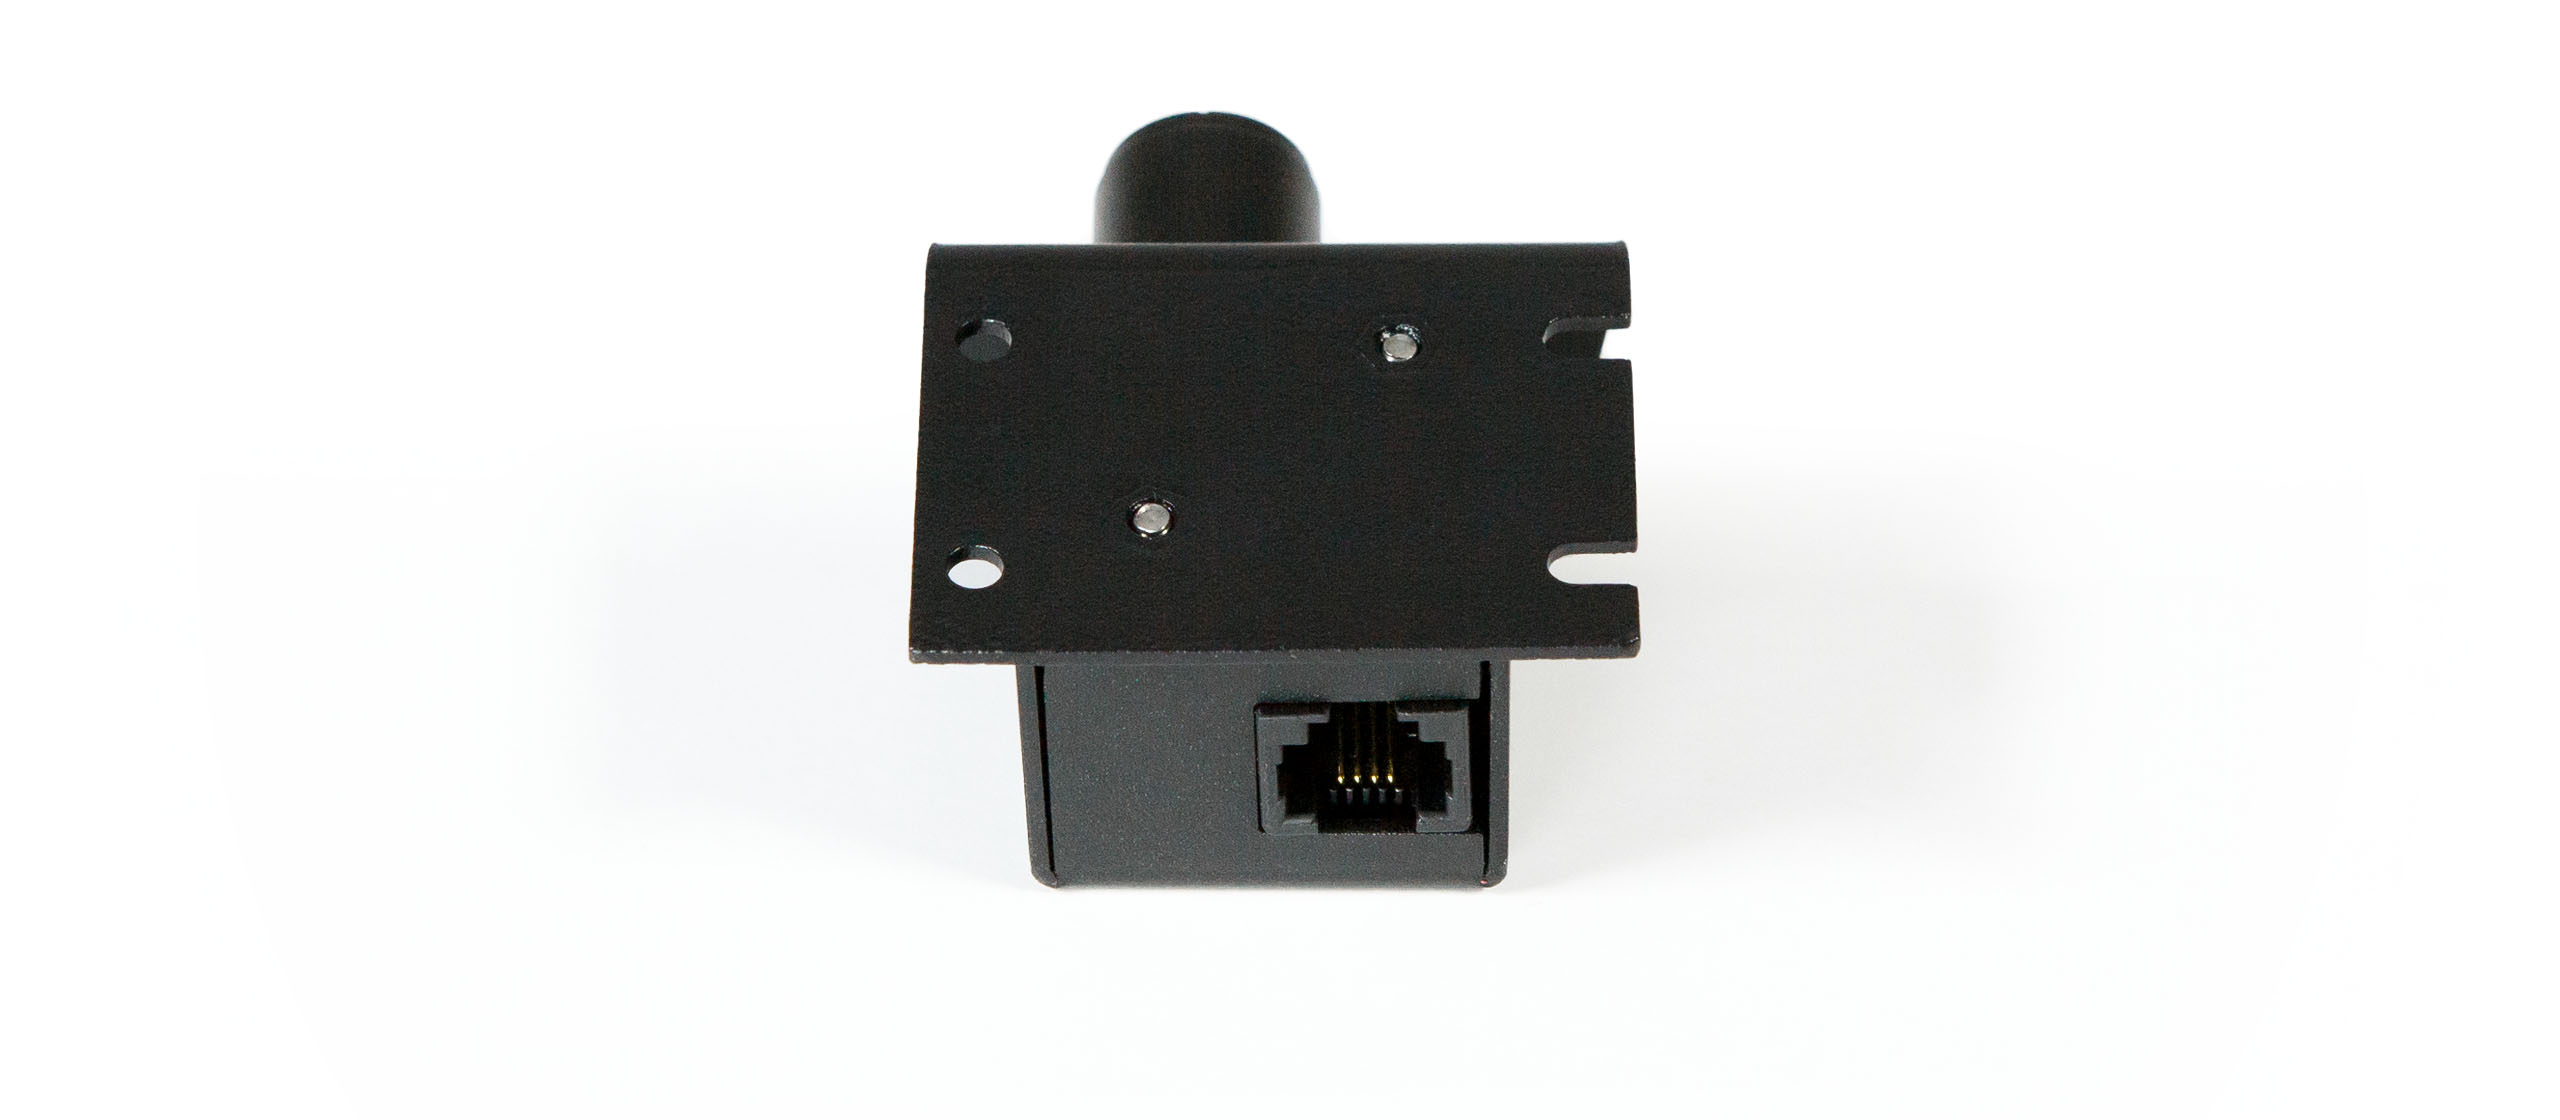 Acr 2 Audiocontrol Pin Wiring Diagram Dash Jpg On Pinterest It